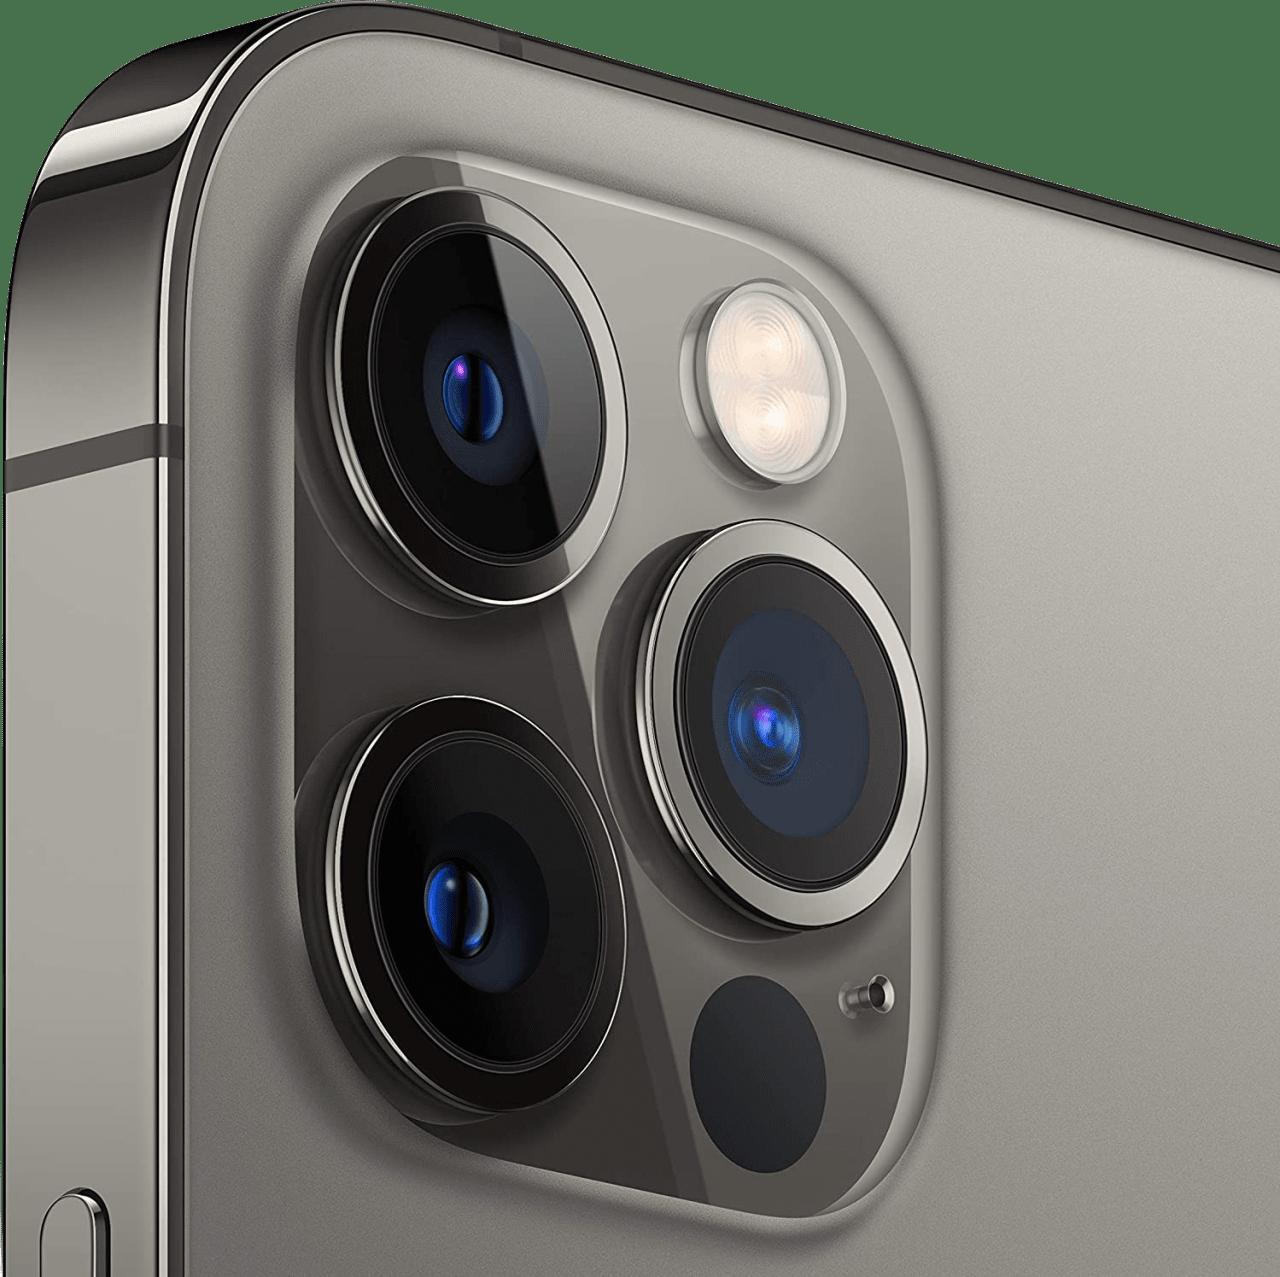 Grau Apple iPhone 12 Pro - 512GB - Dual Sim.3